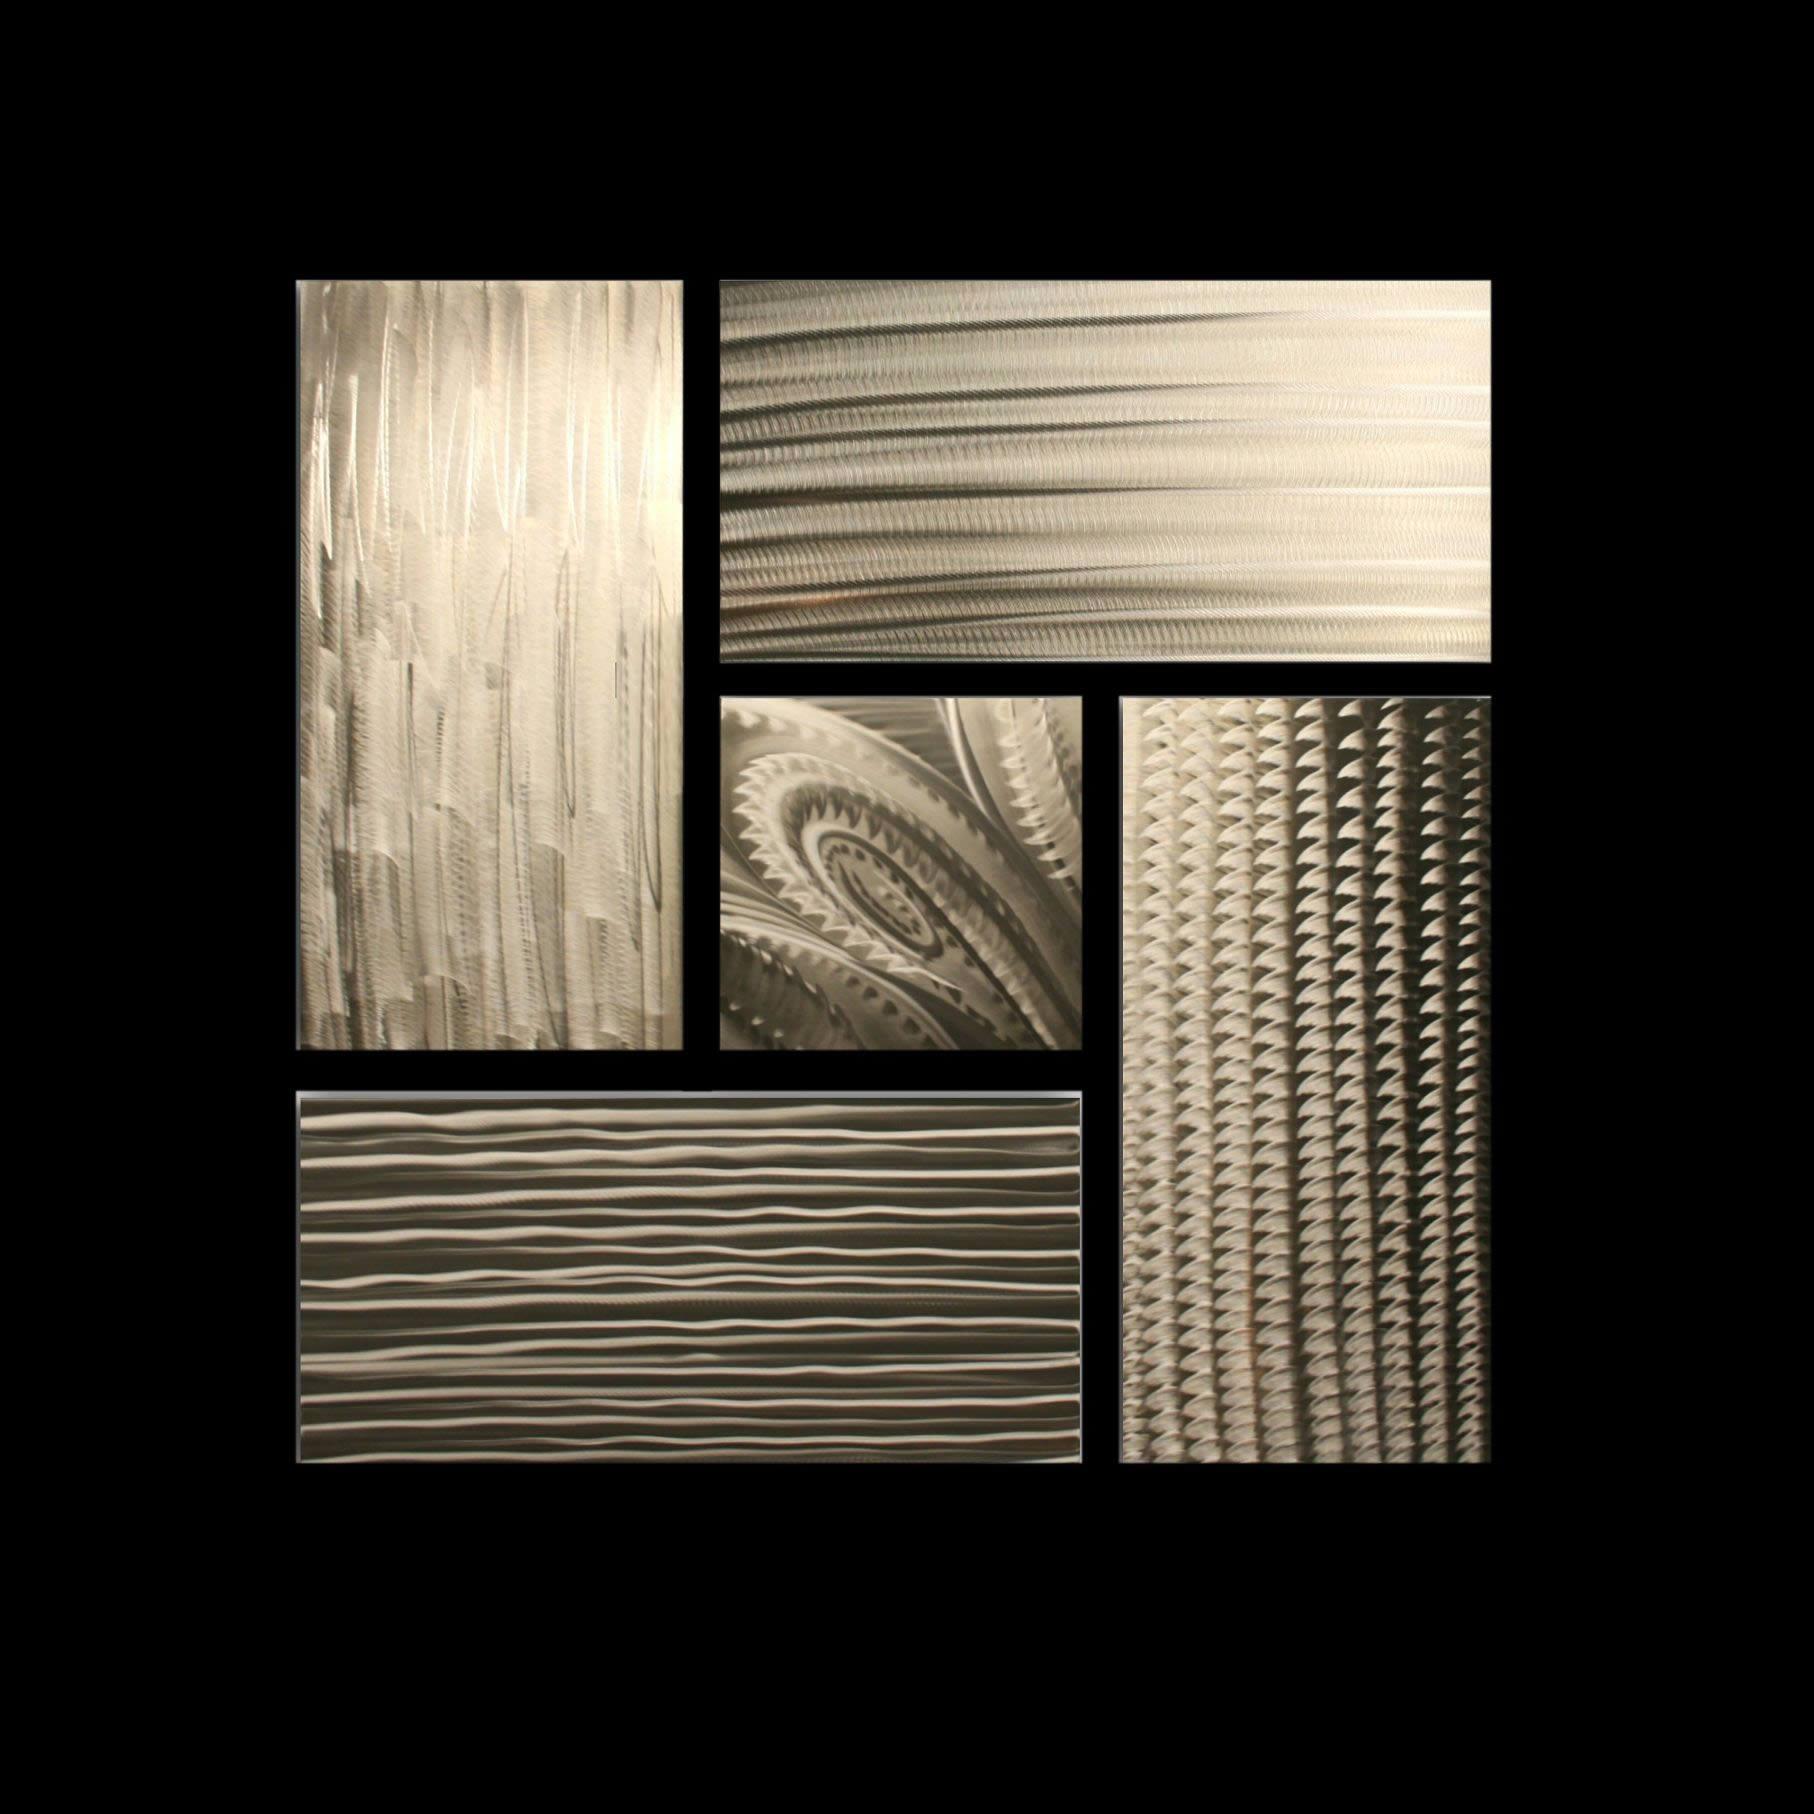 PATIENCE - Hand-Ground Metal Art by Nicholas Yust